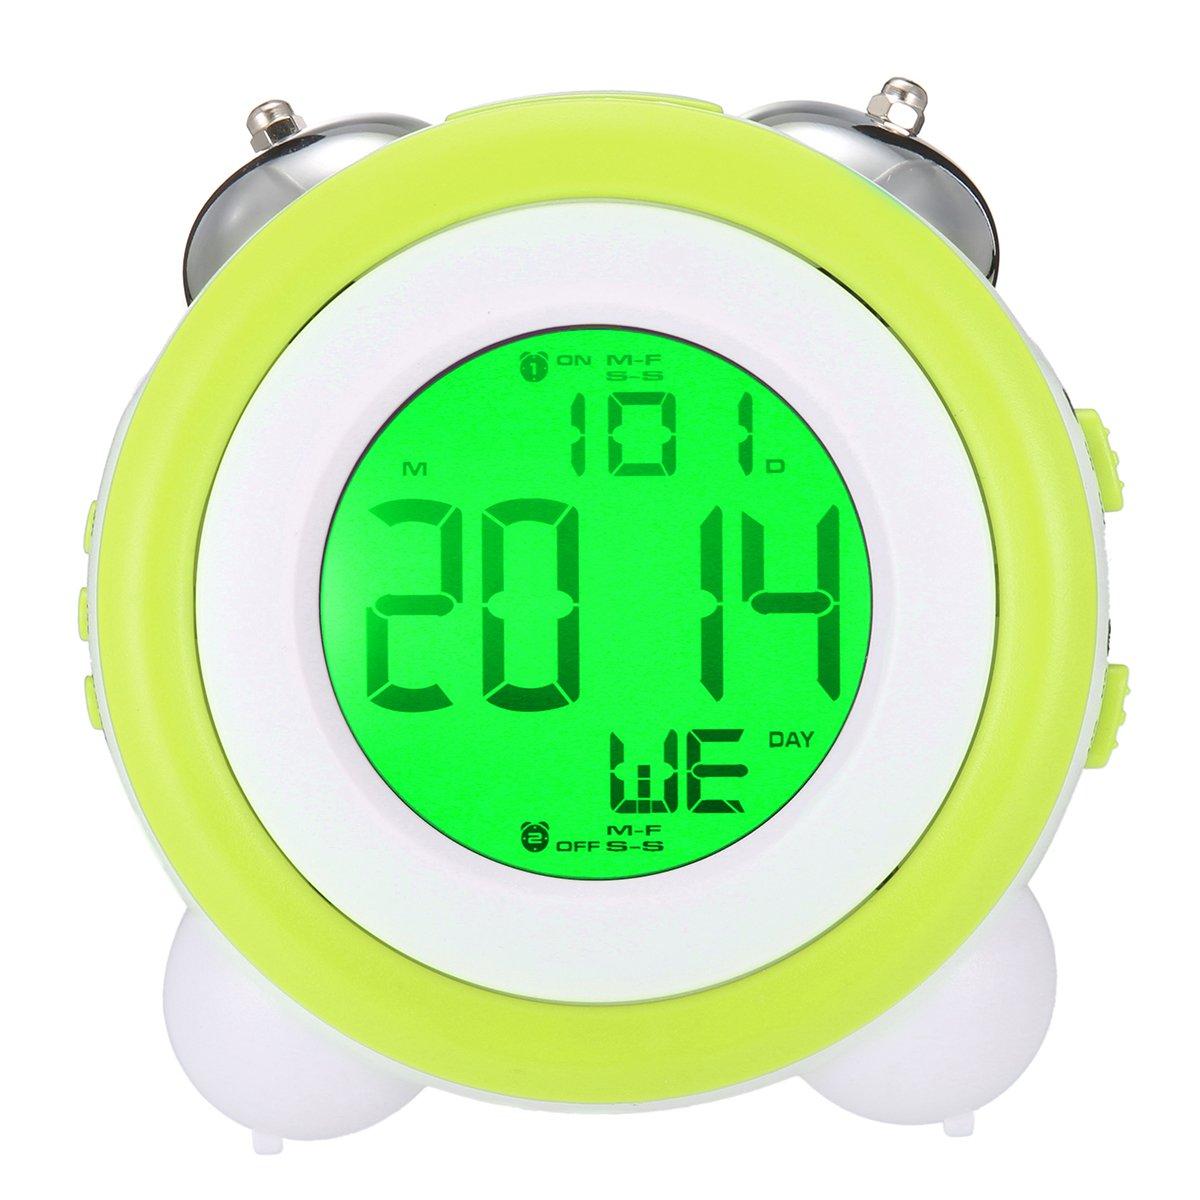 Jeteven LED Digitale ruhig Doppelglockenwecker,lauter Alarm,geräuschlos,großes Zifferblatt von 4 Zoll, 3*AA Batterien (Batterien nicht im Lieferumfang) Grün